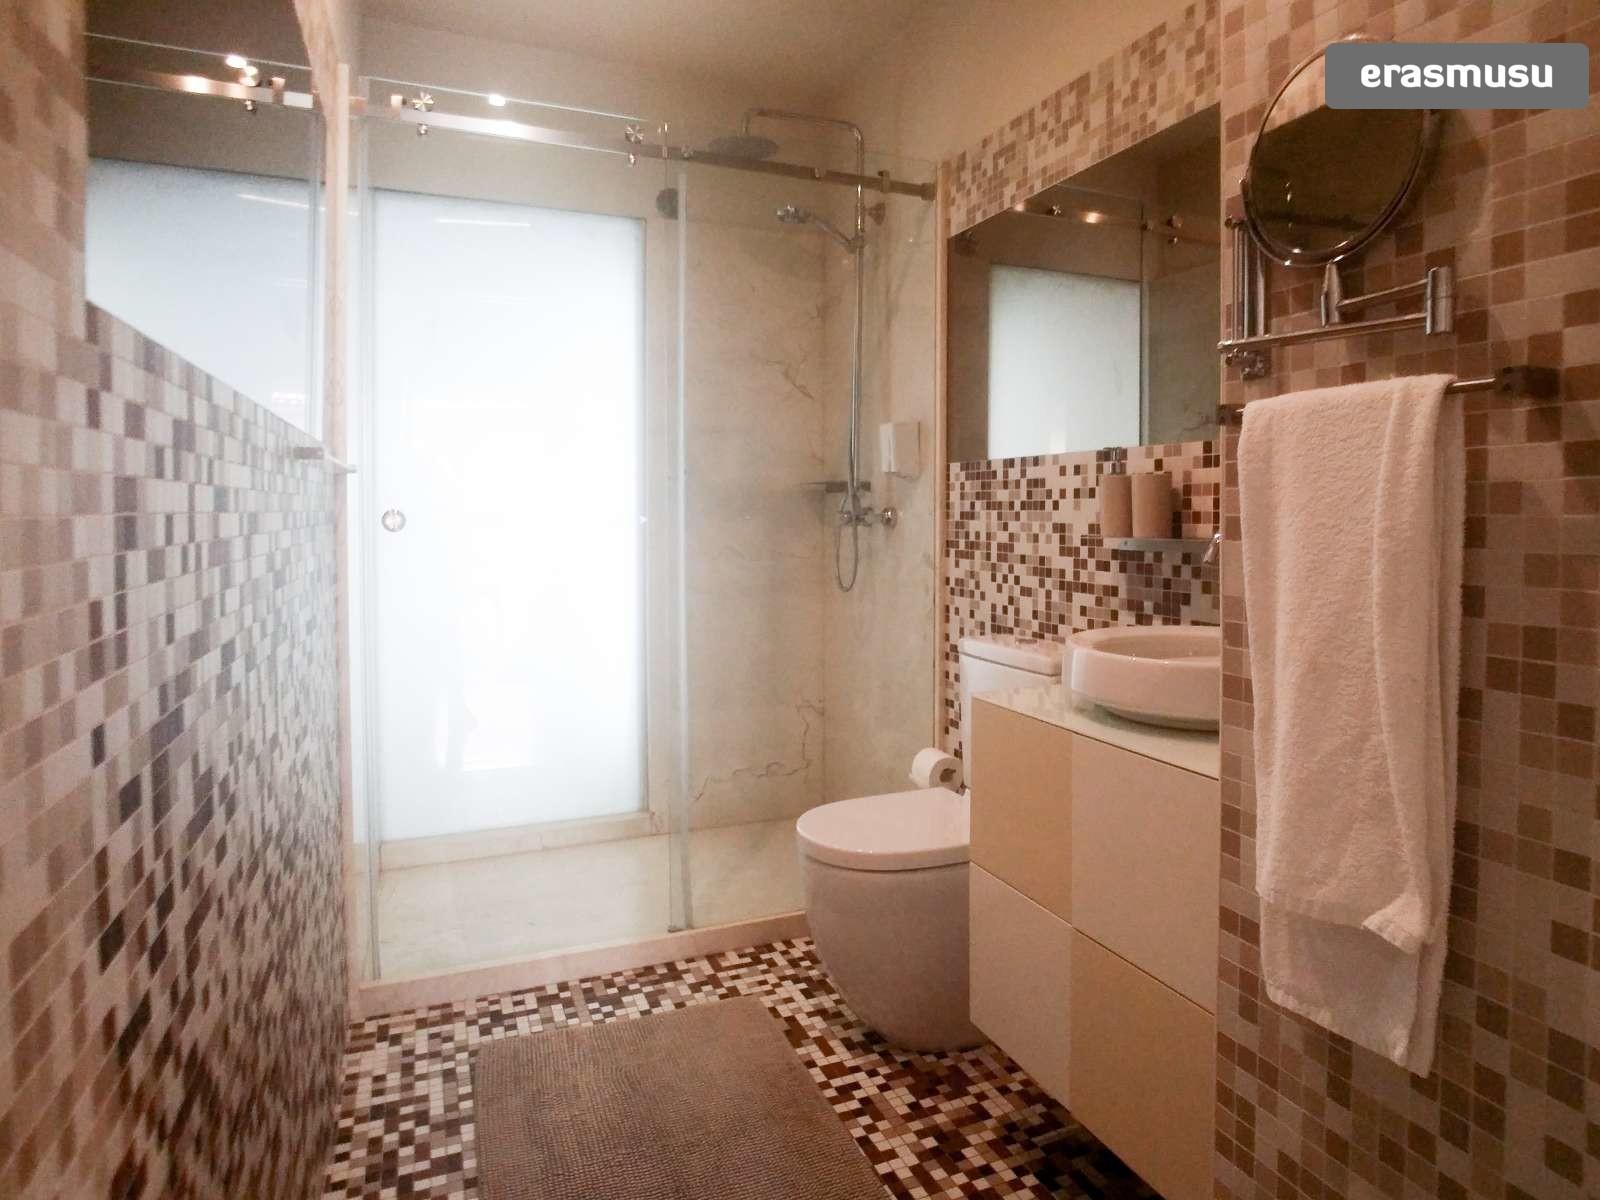 furnished-studio-apartment-rent-sao-nicolau-f65635e11166b9399976